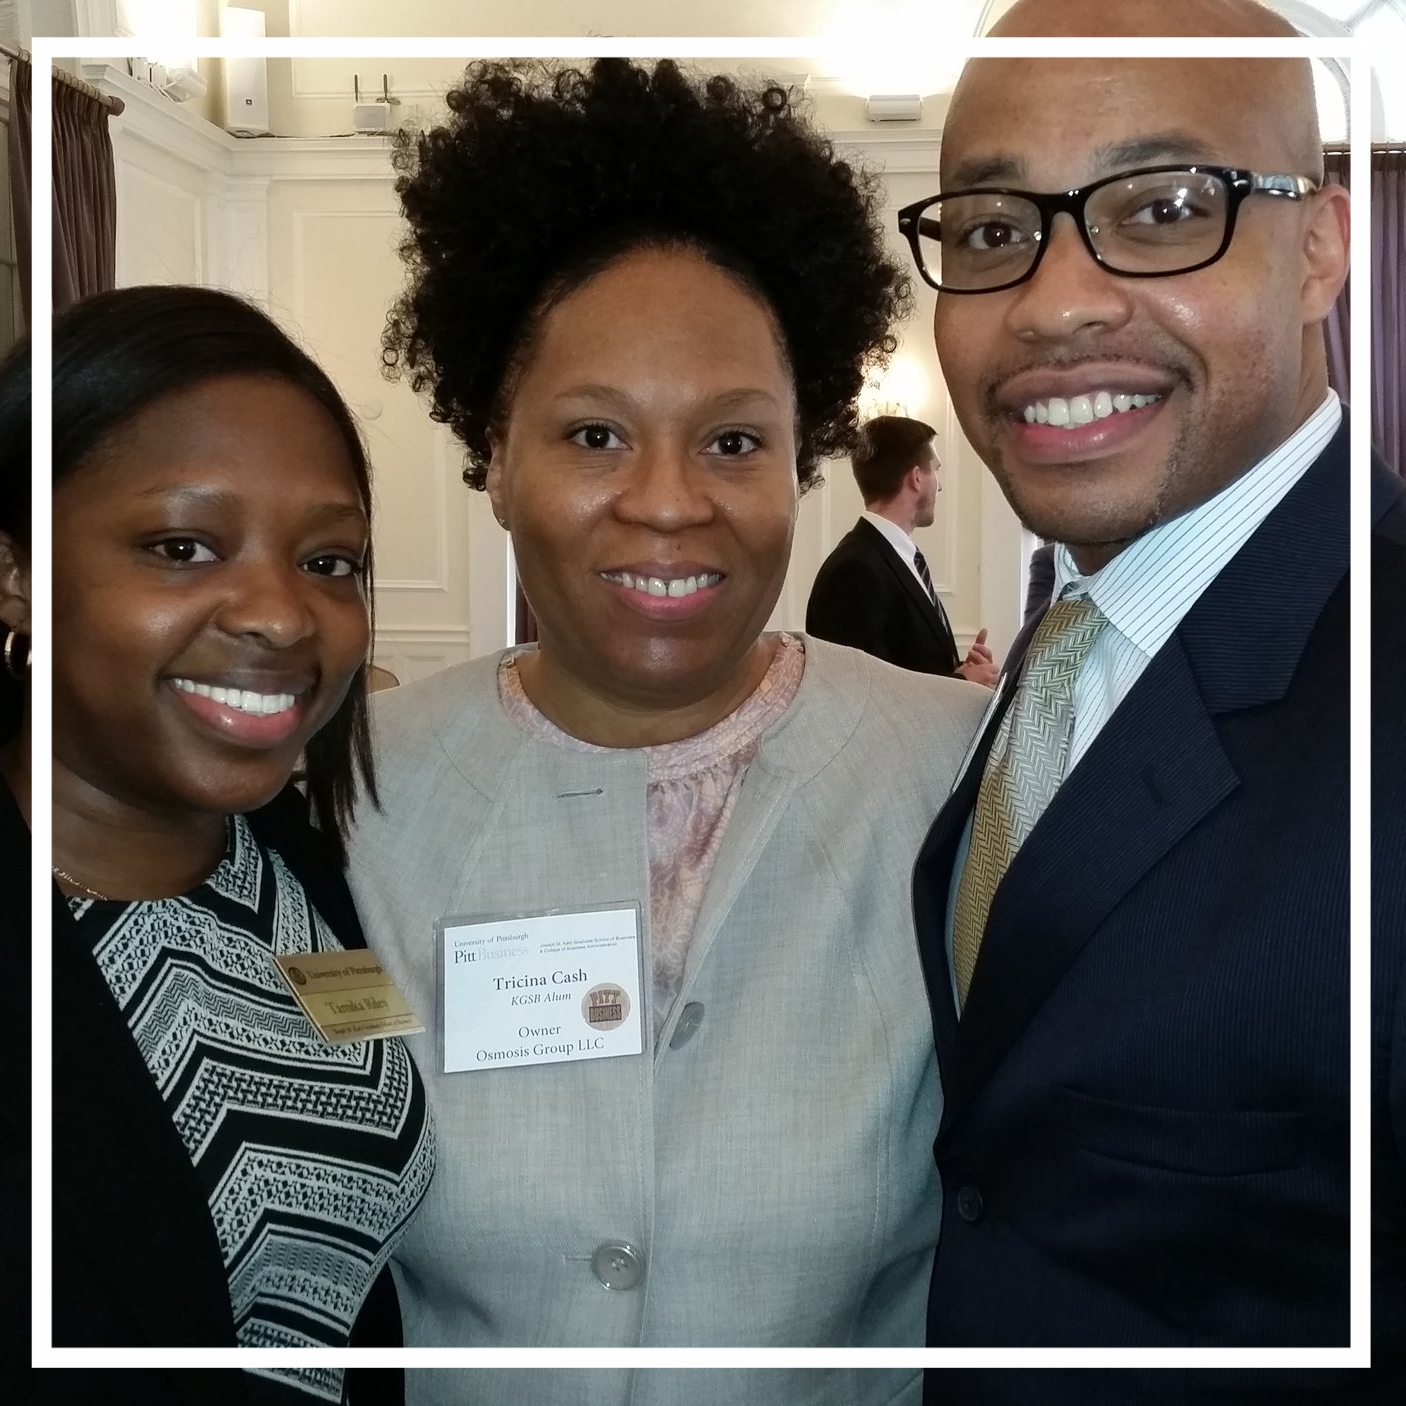 NBMBAA Pittsburgh Partner - Tricina Cash, PBAN Representative